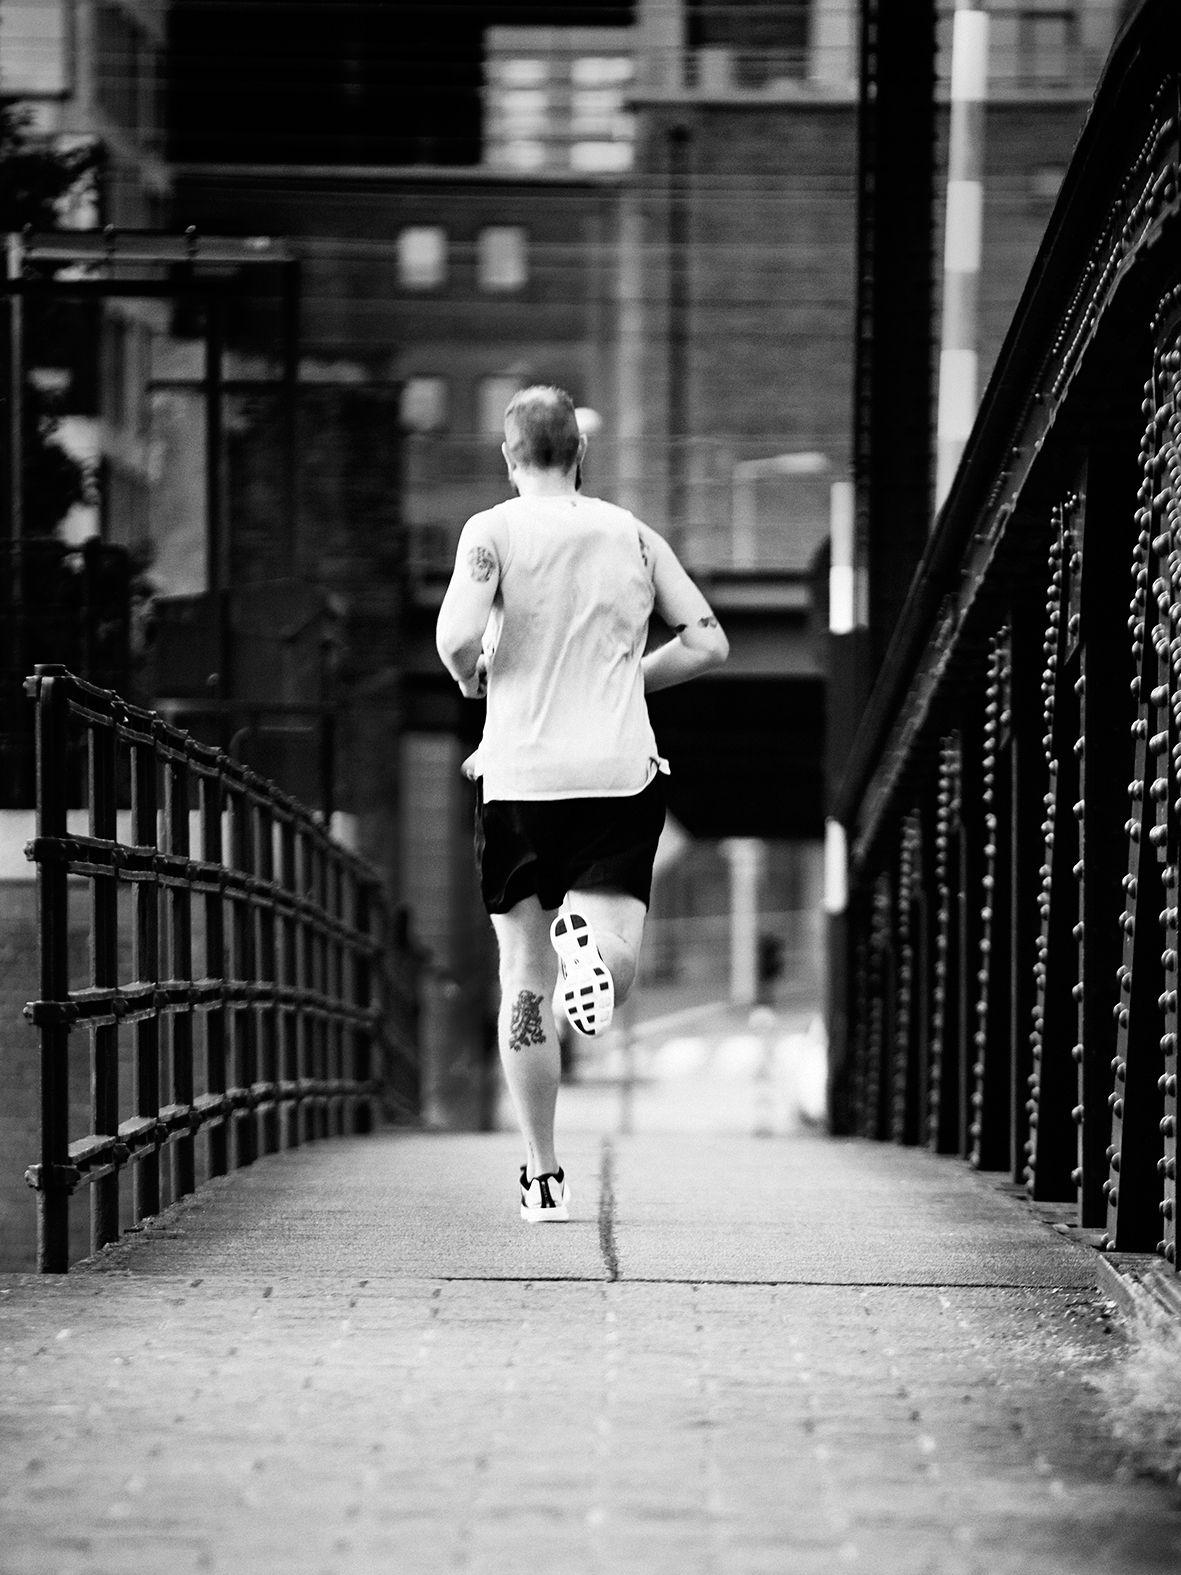 Nike x urbanrunners on behance nike running marathon